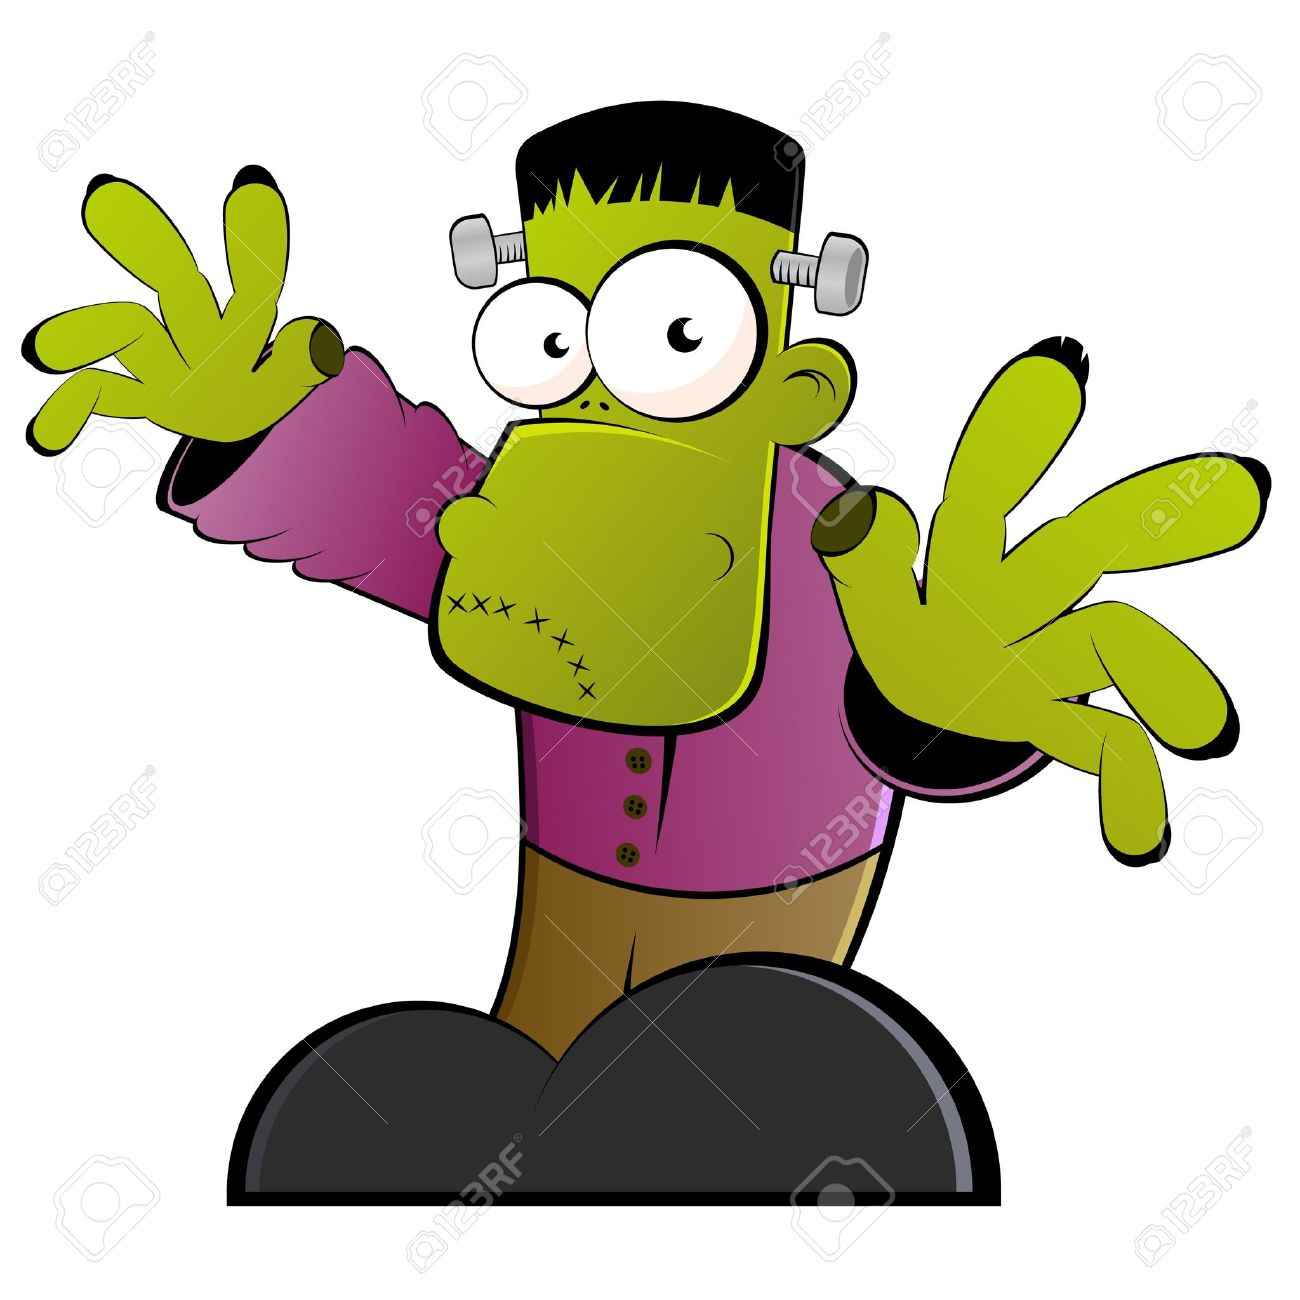 Halloween free download best. Frankenstein clipart monster